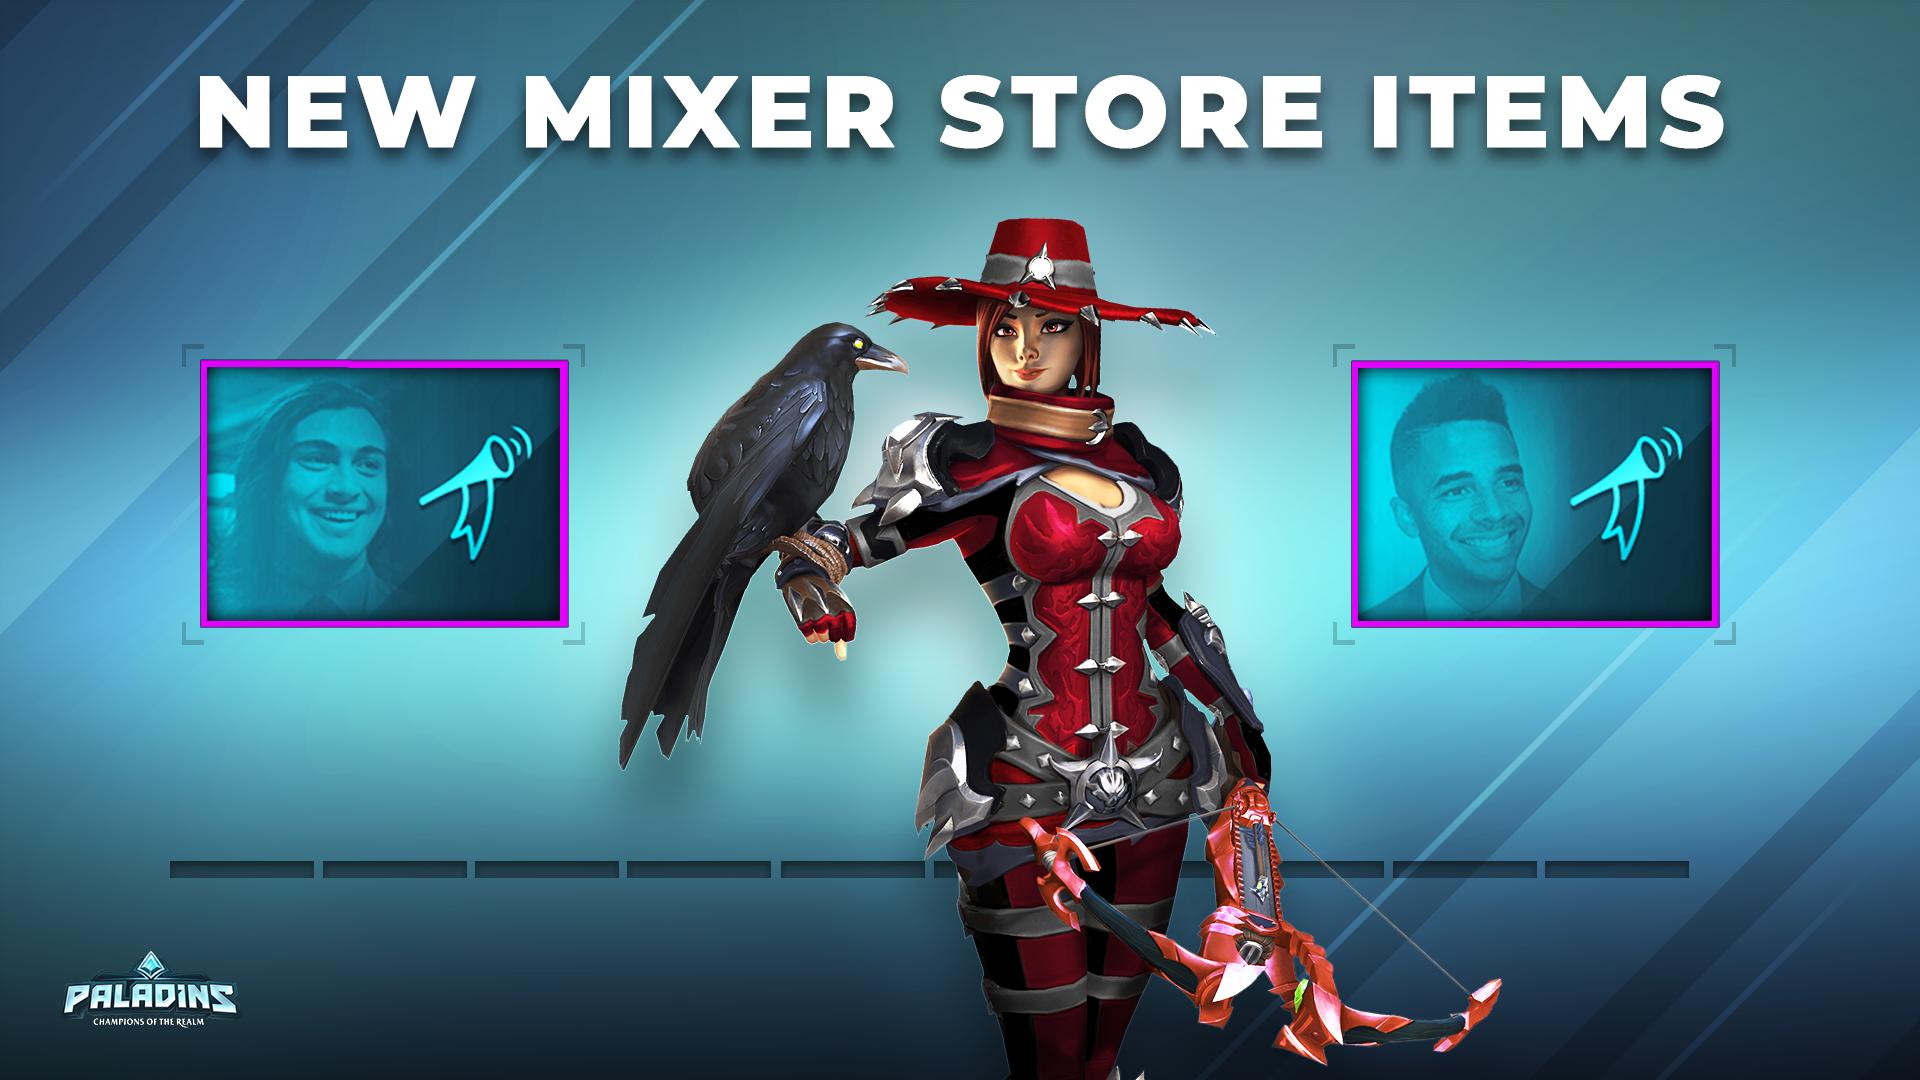 Mixer-Store-Promo.png